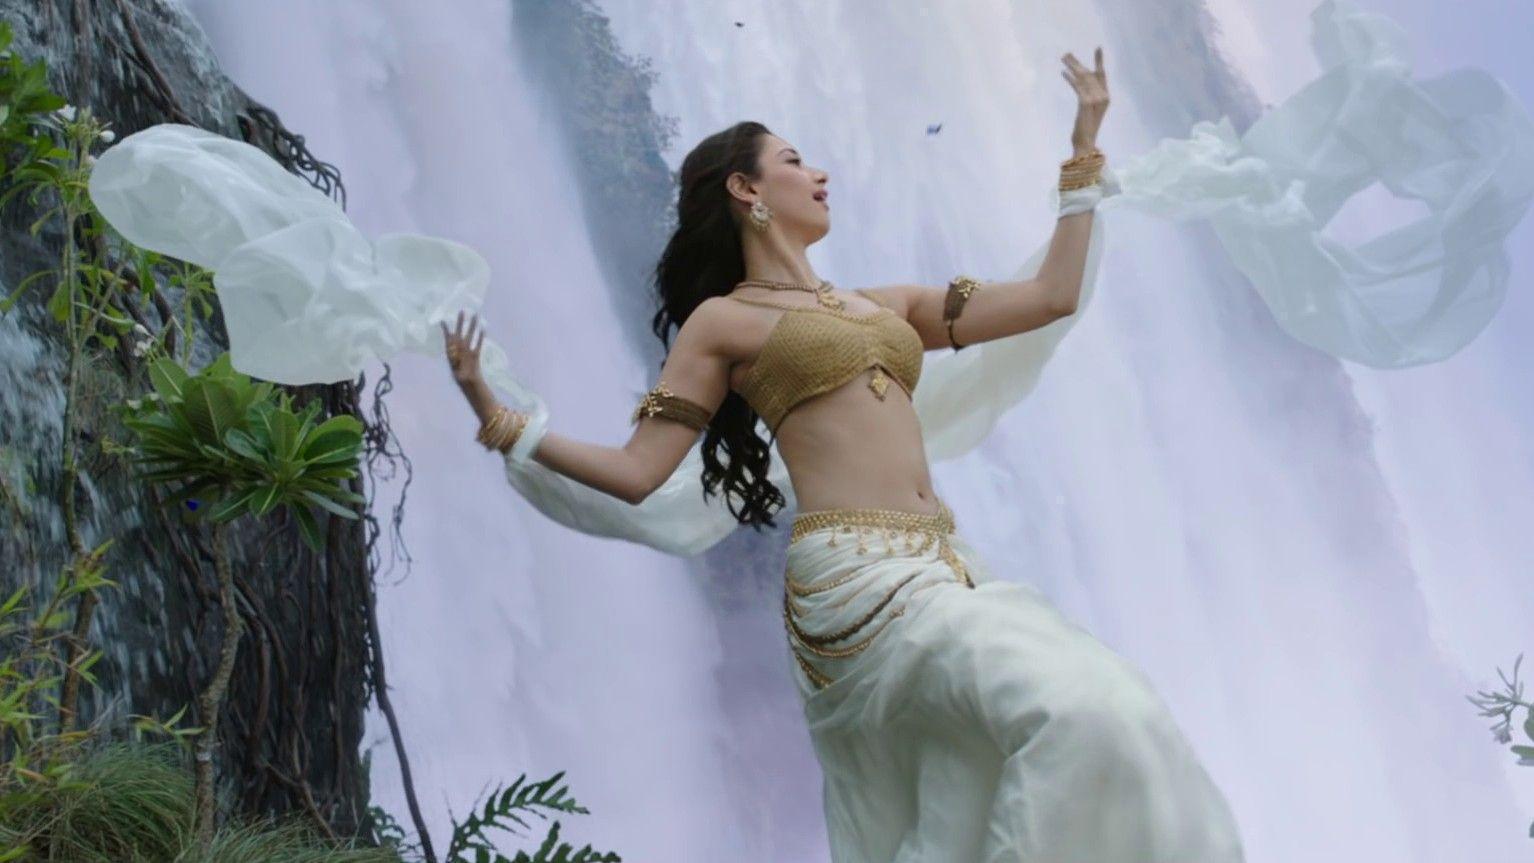 Tamanna Bhatia Baahubali Movie Actress Wallpaper - DreamLoveWallpapers